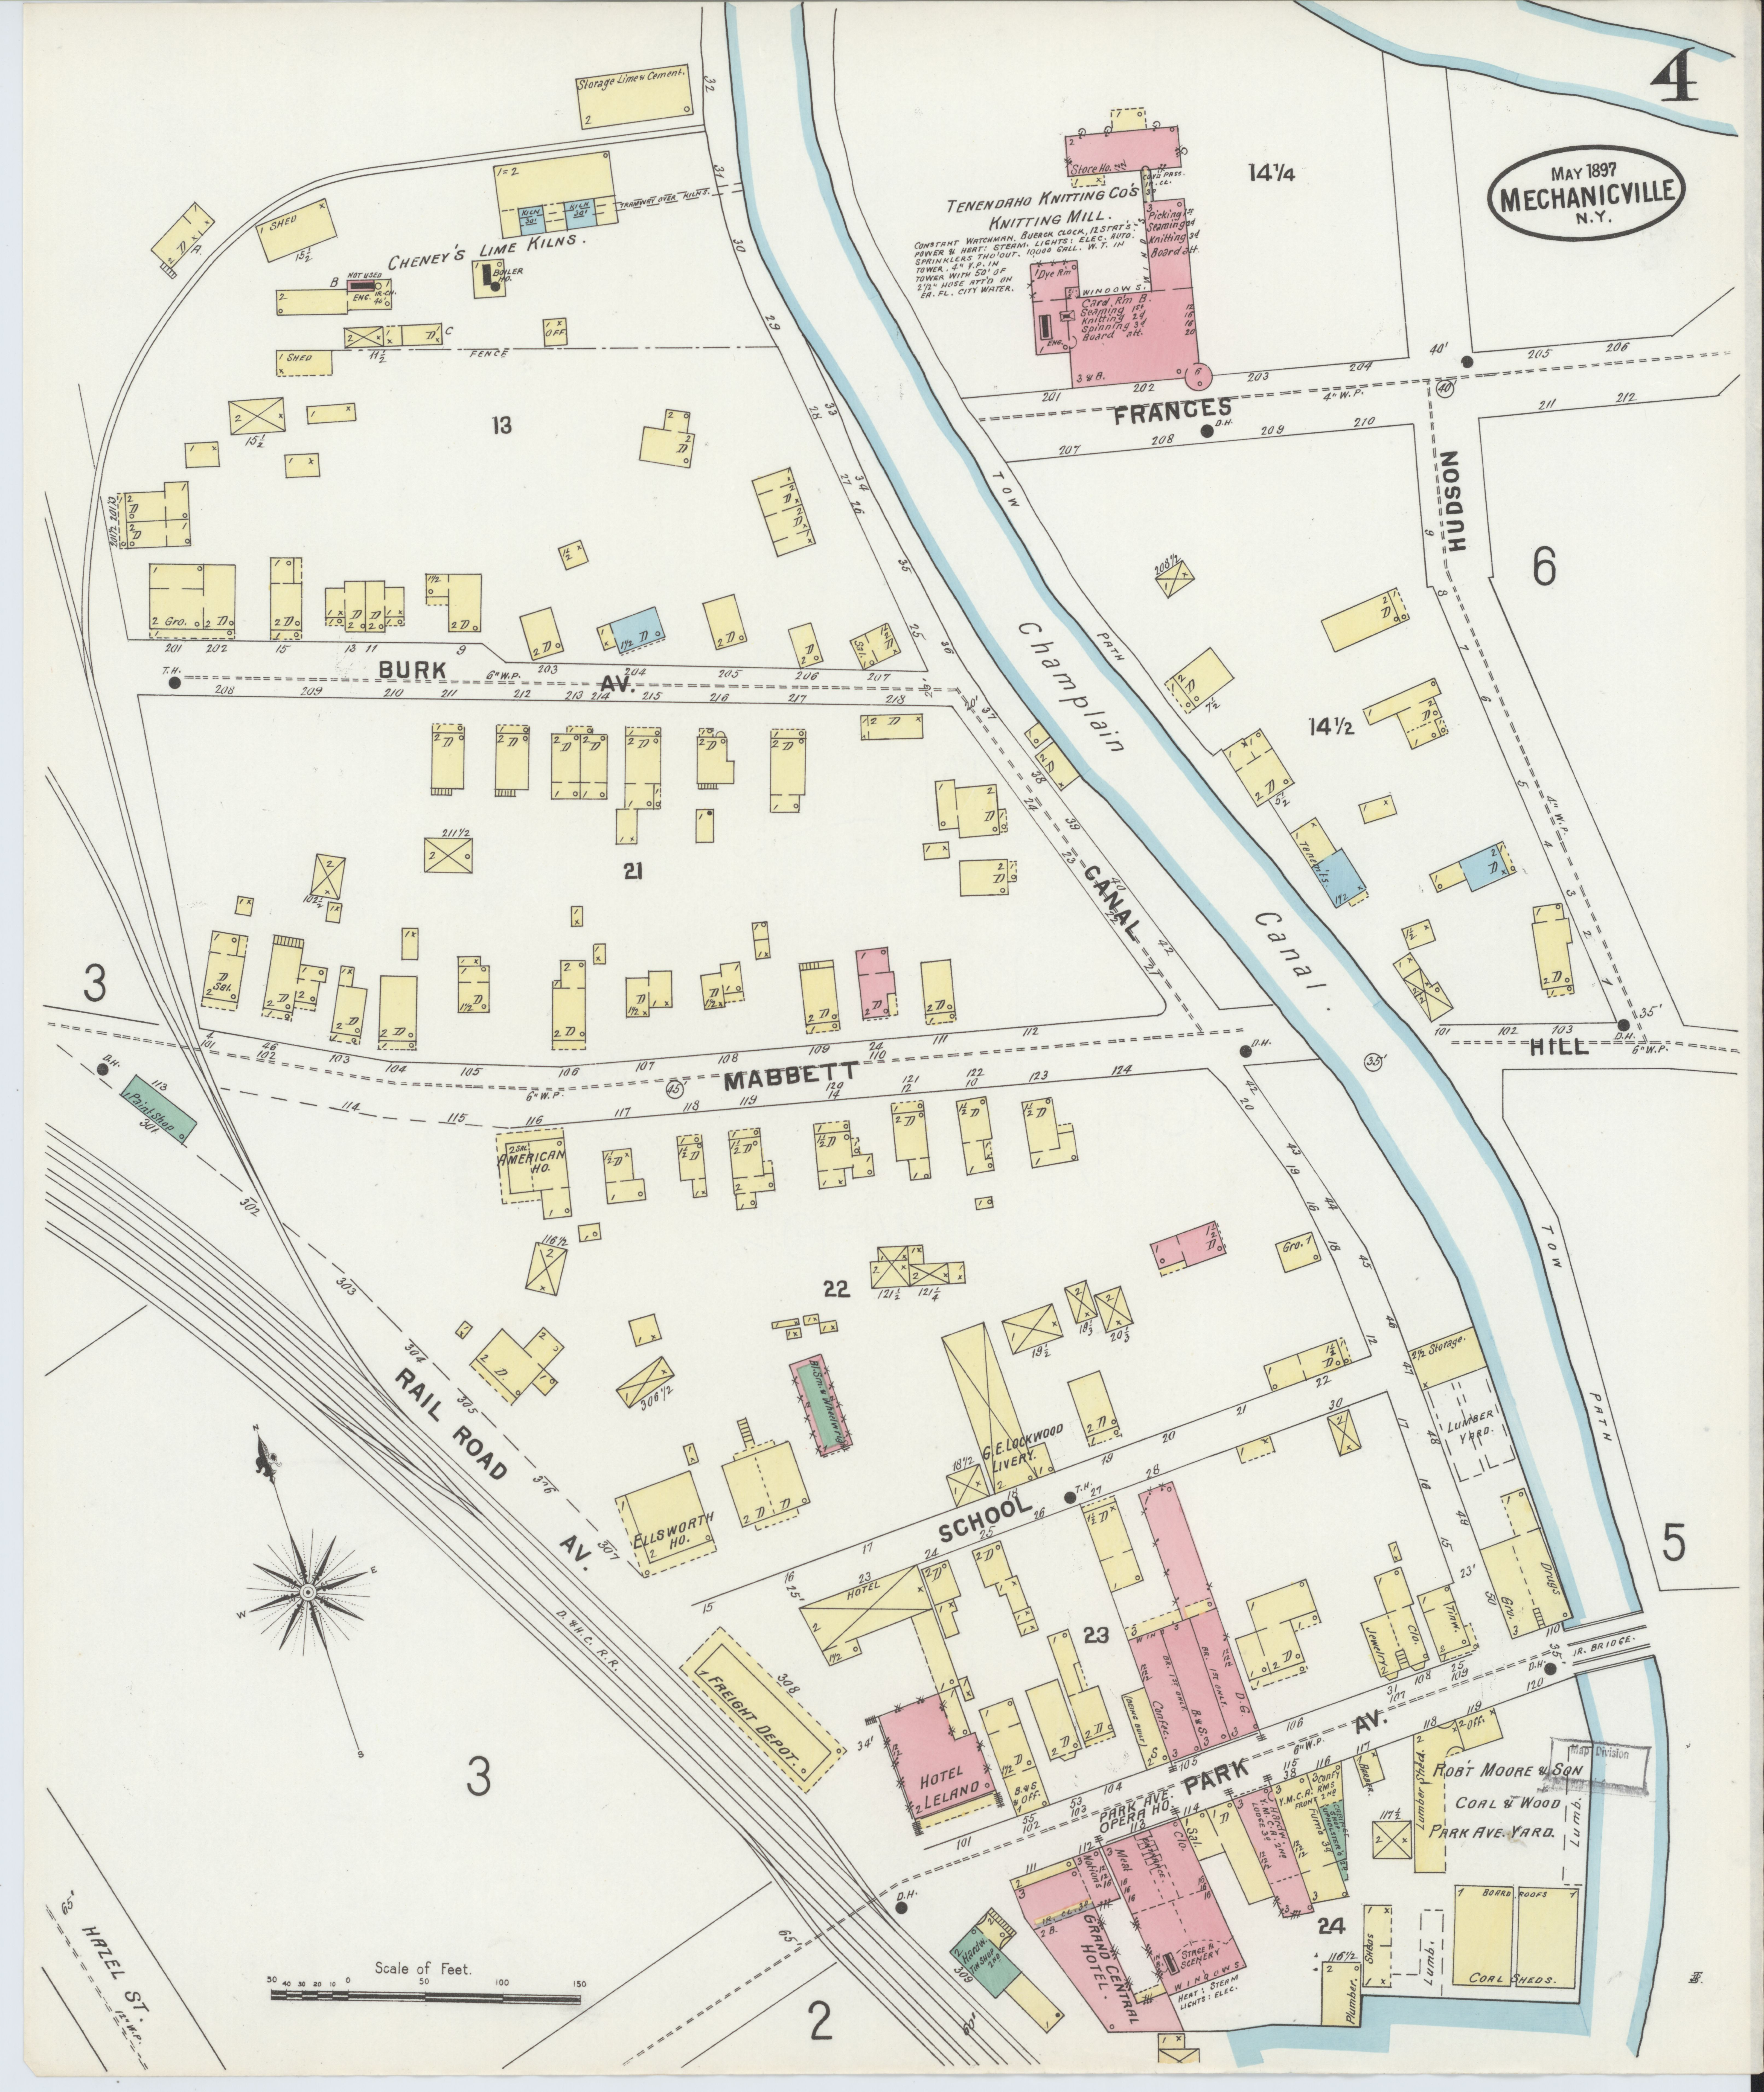 Saratoga New York Map.File Sanborn Fire Insurance Map From Mechanicville Saratoga County